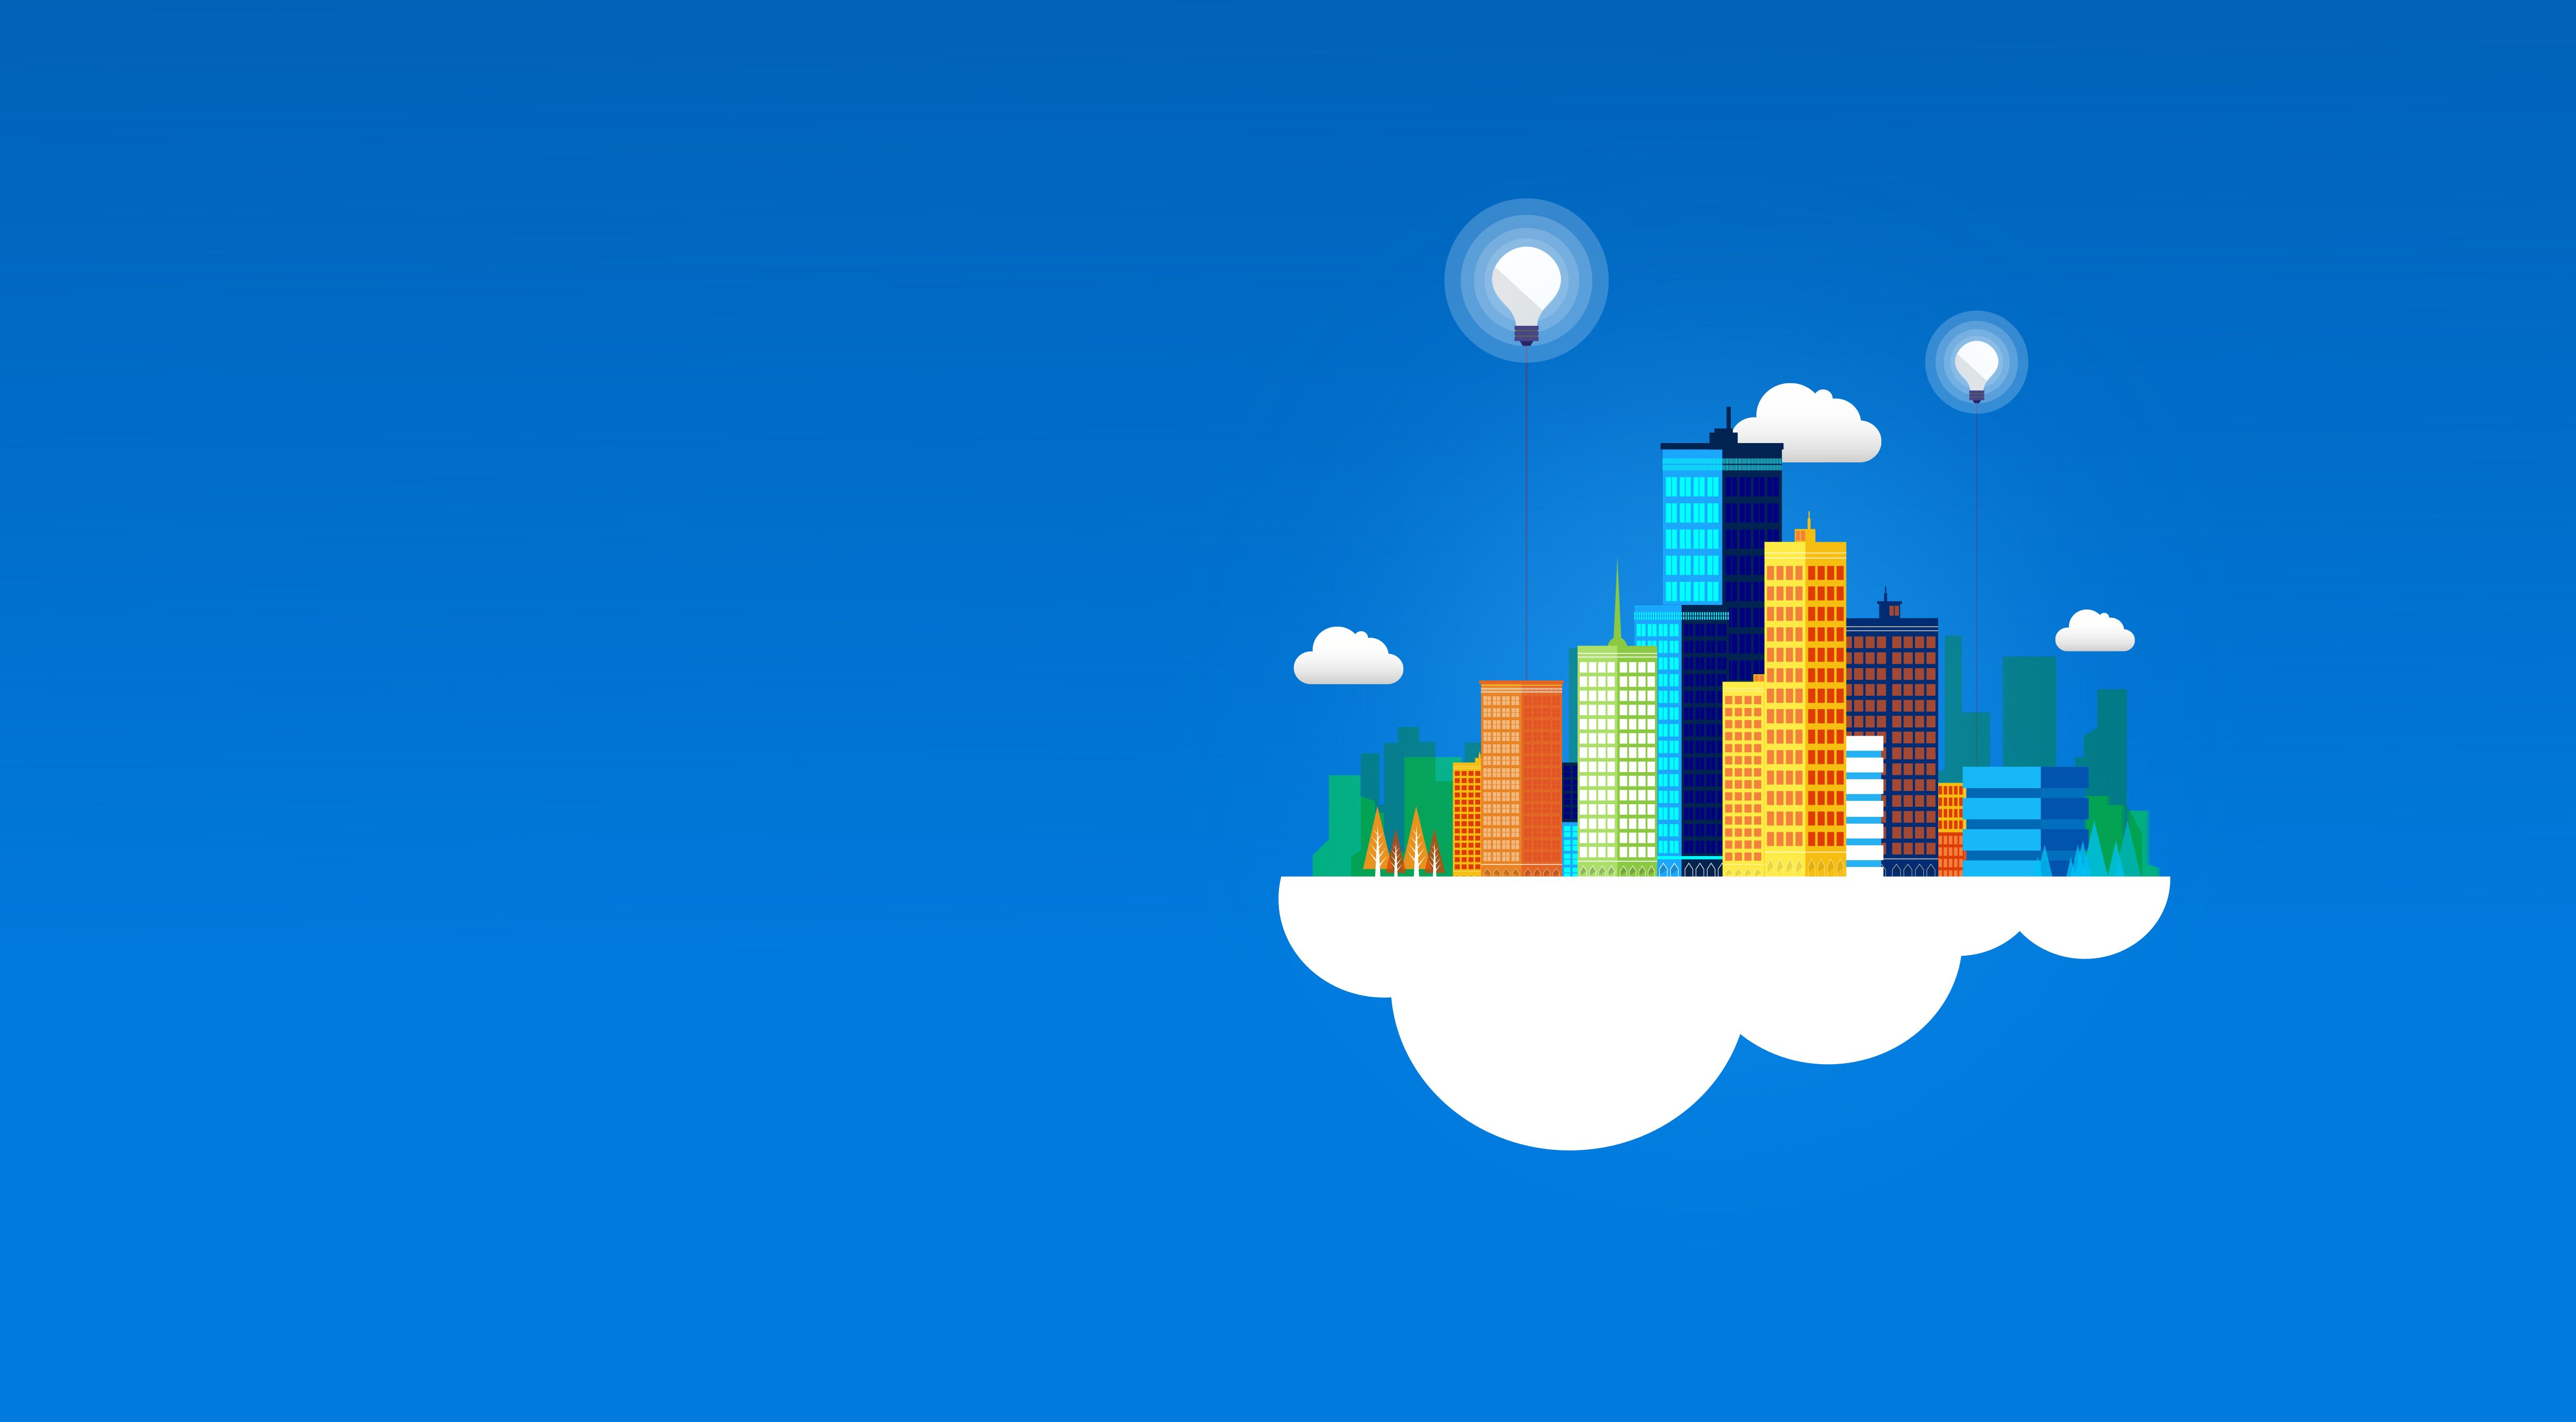 Cloud Infrastructure, Network, Seo, Security, Renewableenergy, HQ Photo